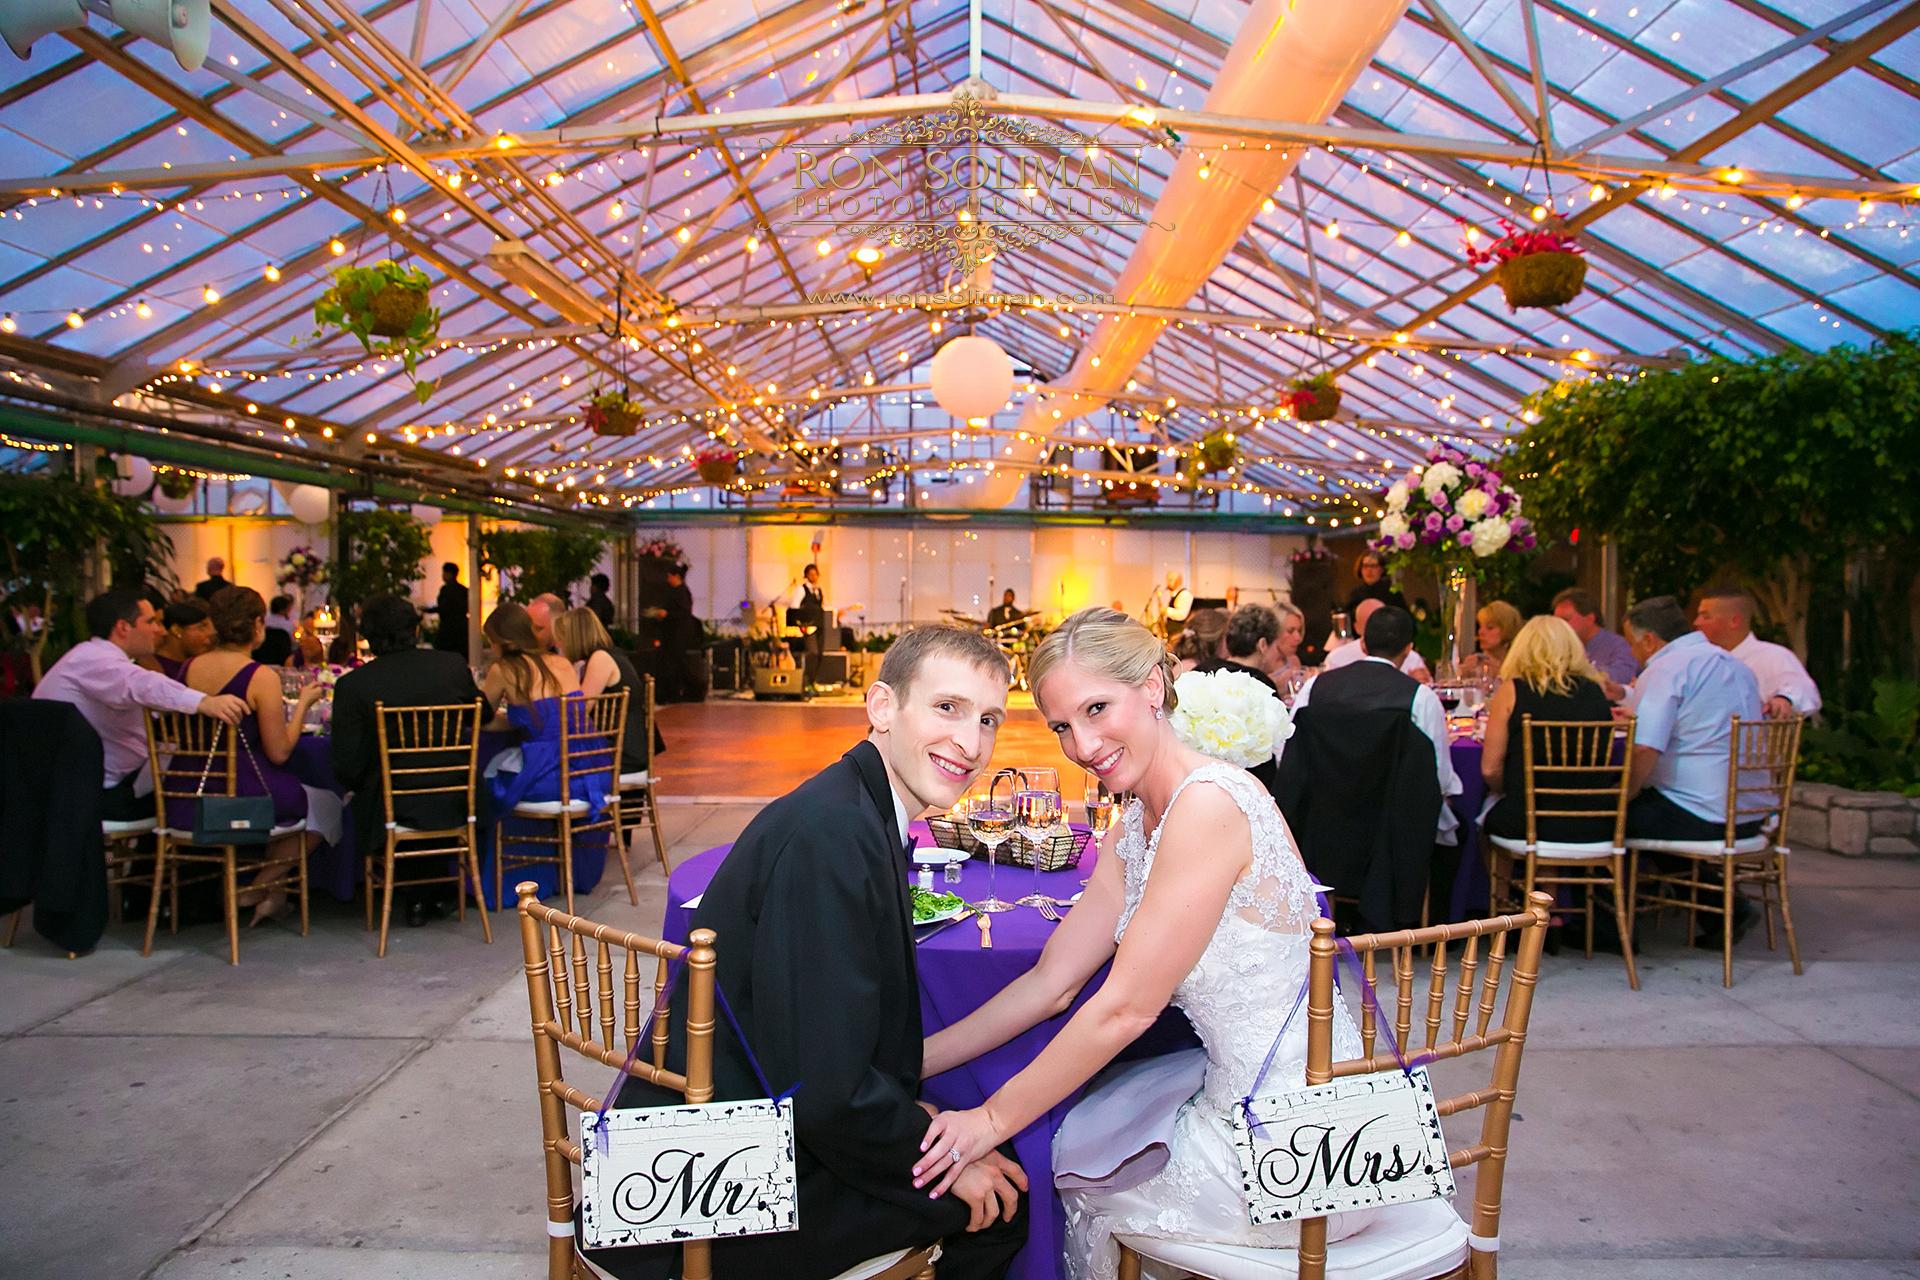 Fairmount Park Horticulture Center Wedding Ideas 2018